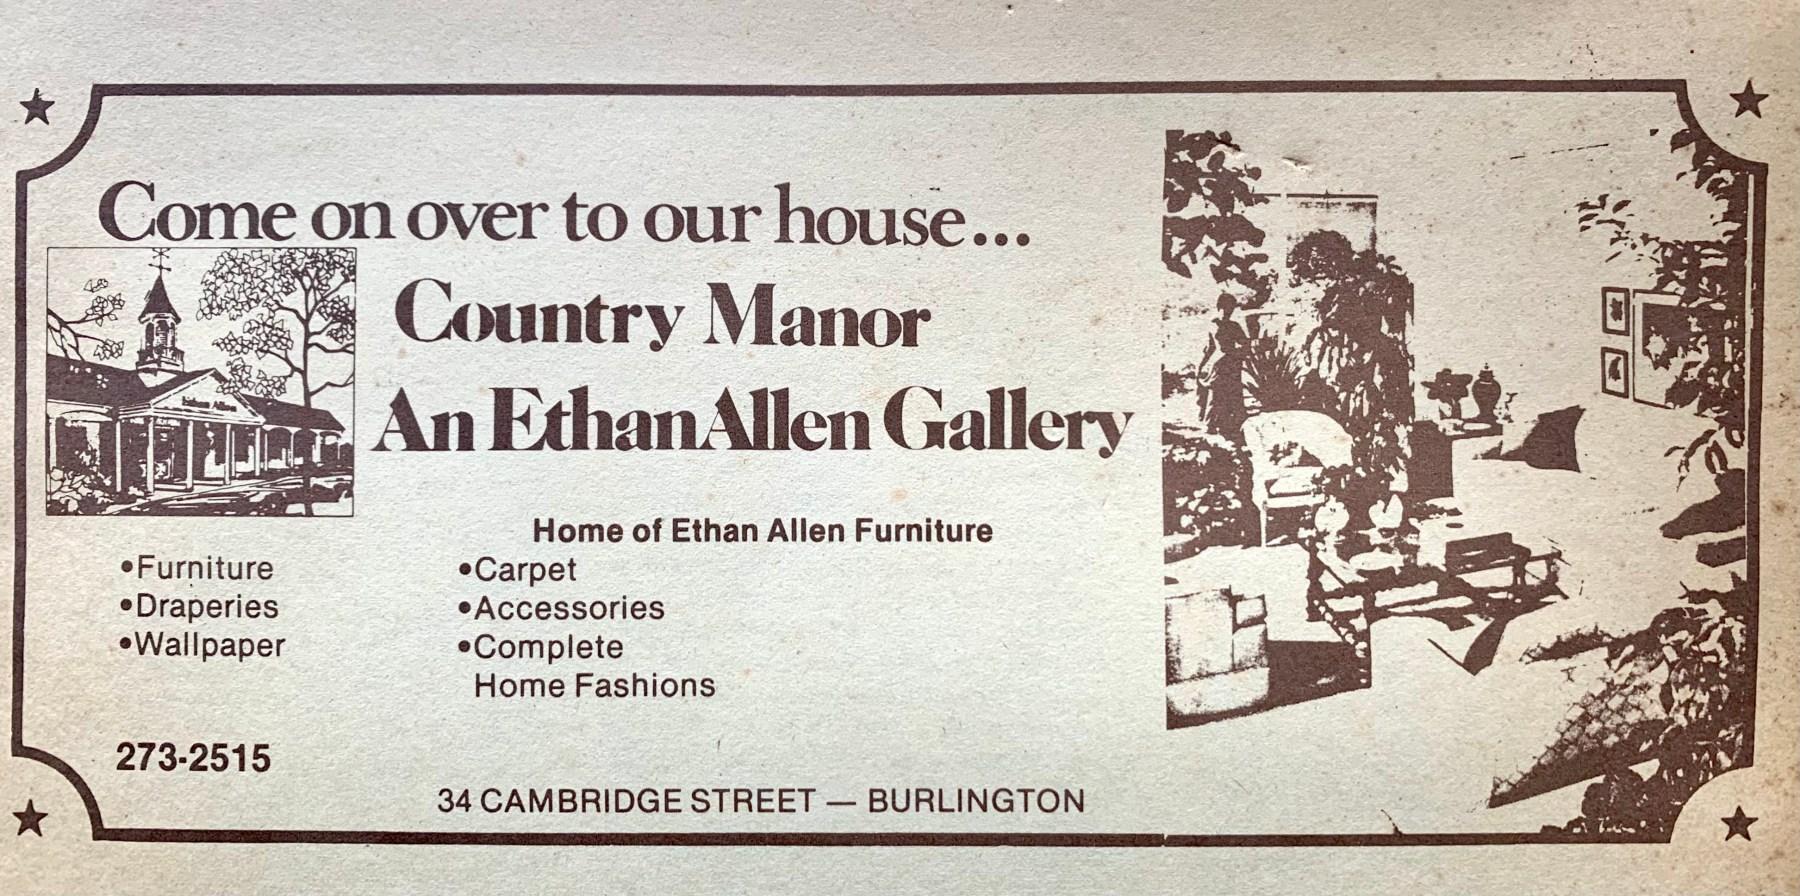 Ethan Allen Country Manor ad, 34 Cambridge Street, Burlington MA